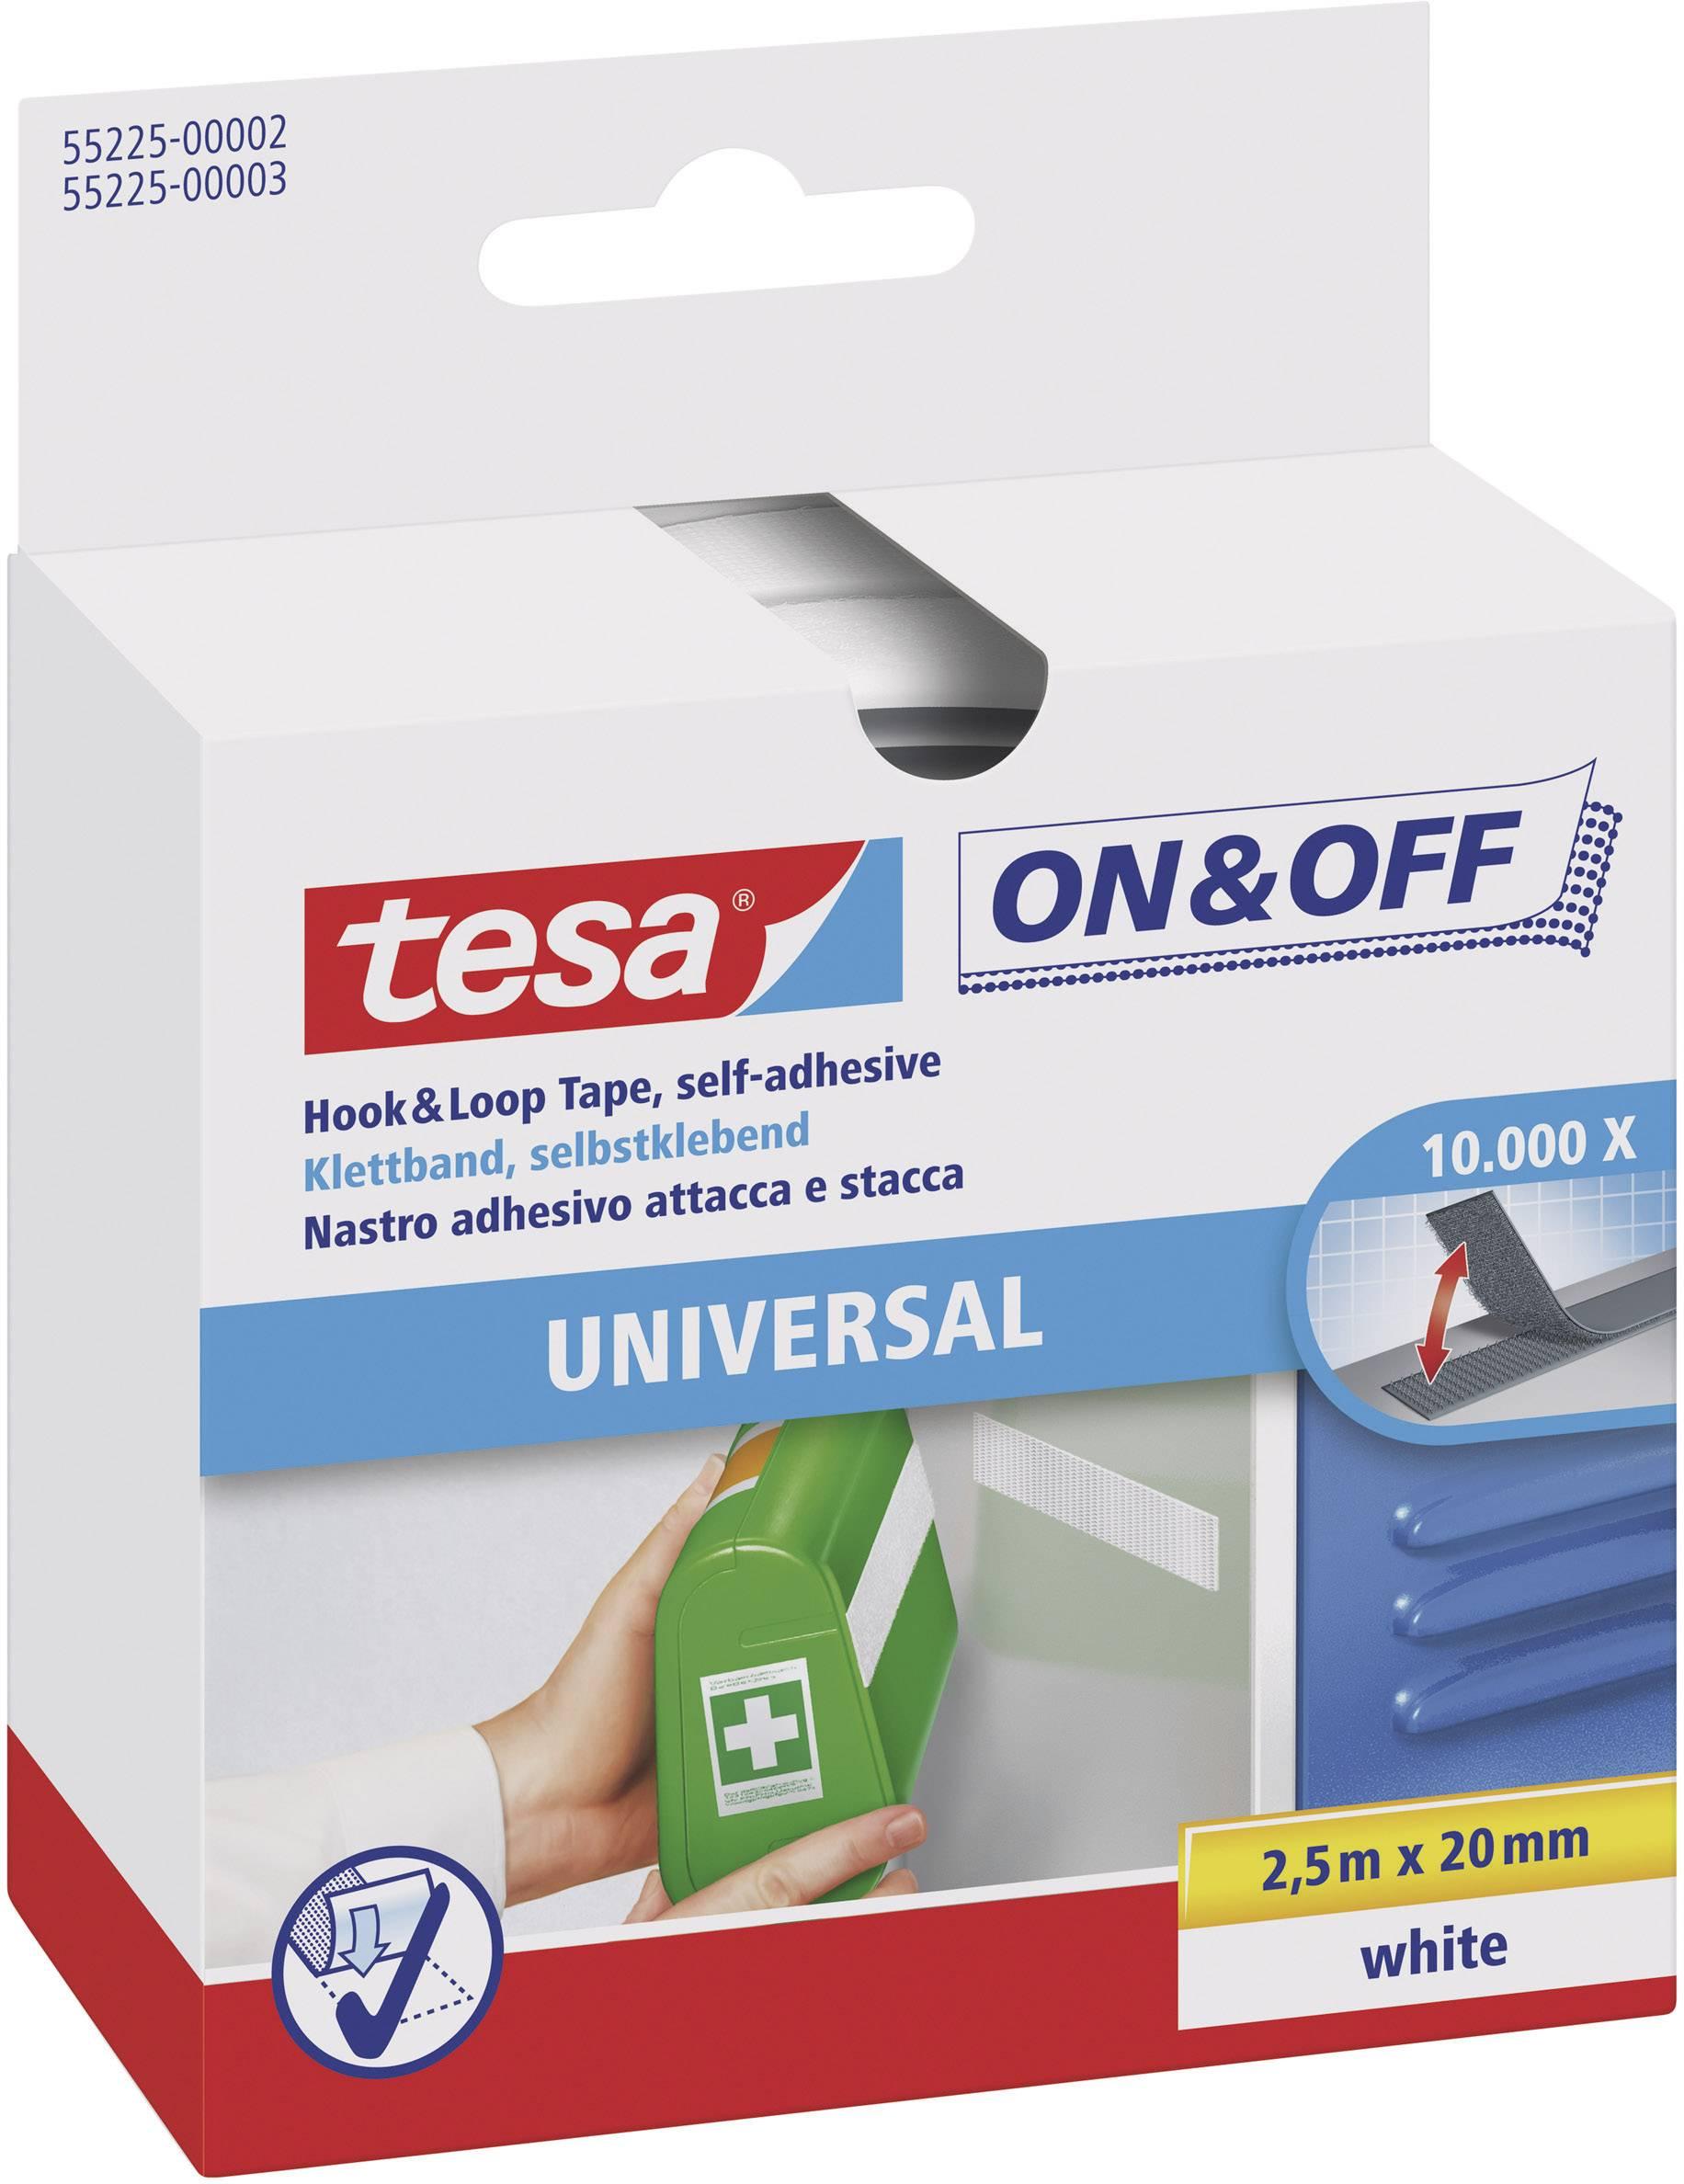 Lepiaci pásik so suchým zipsom TESA On & Off 55225-02-00, (d x š) 2500 mm x 20 mm, biela, 1 ks